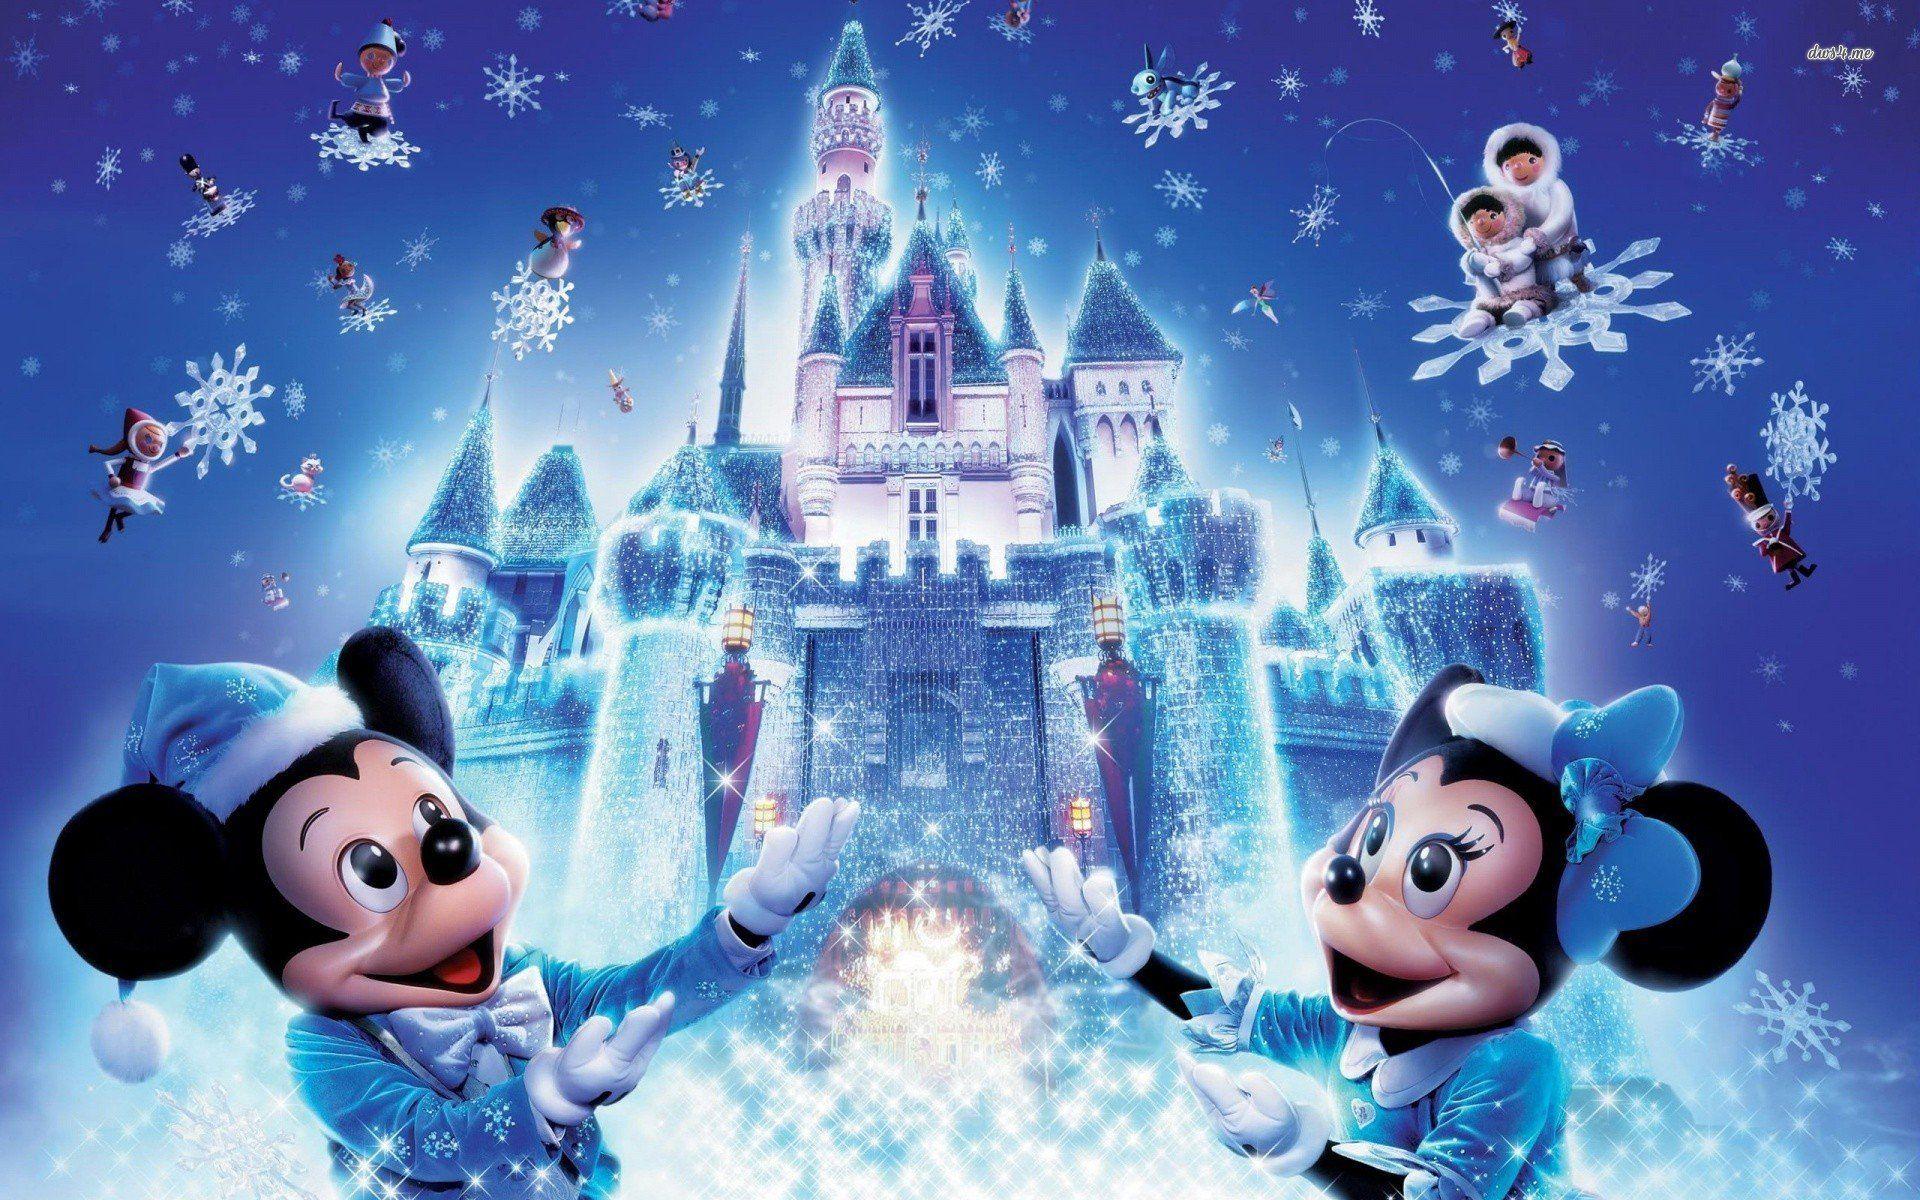 Best Wallpaper Christmas Mickey Mouse - 21e045284b7086425722bbf2defc0e6b  Collection_543225 .jpg